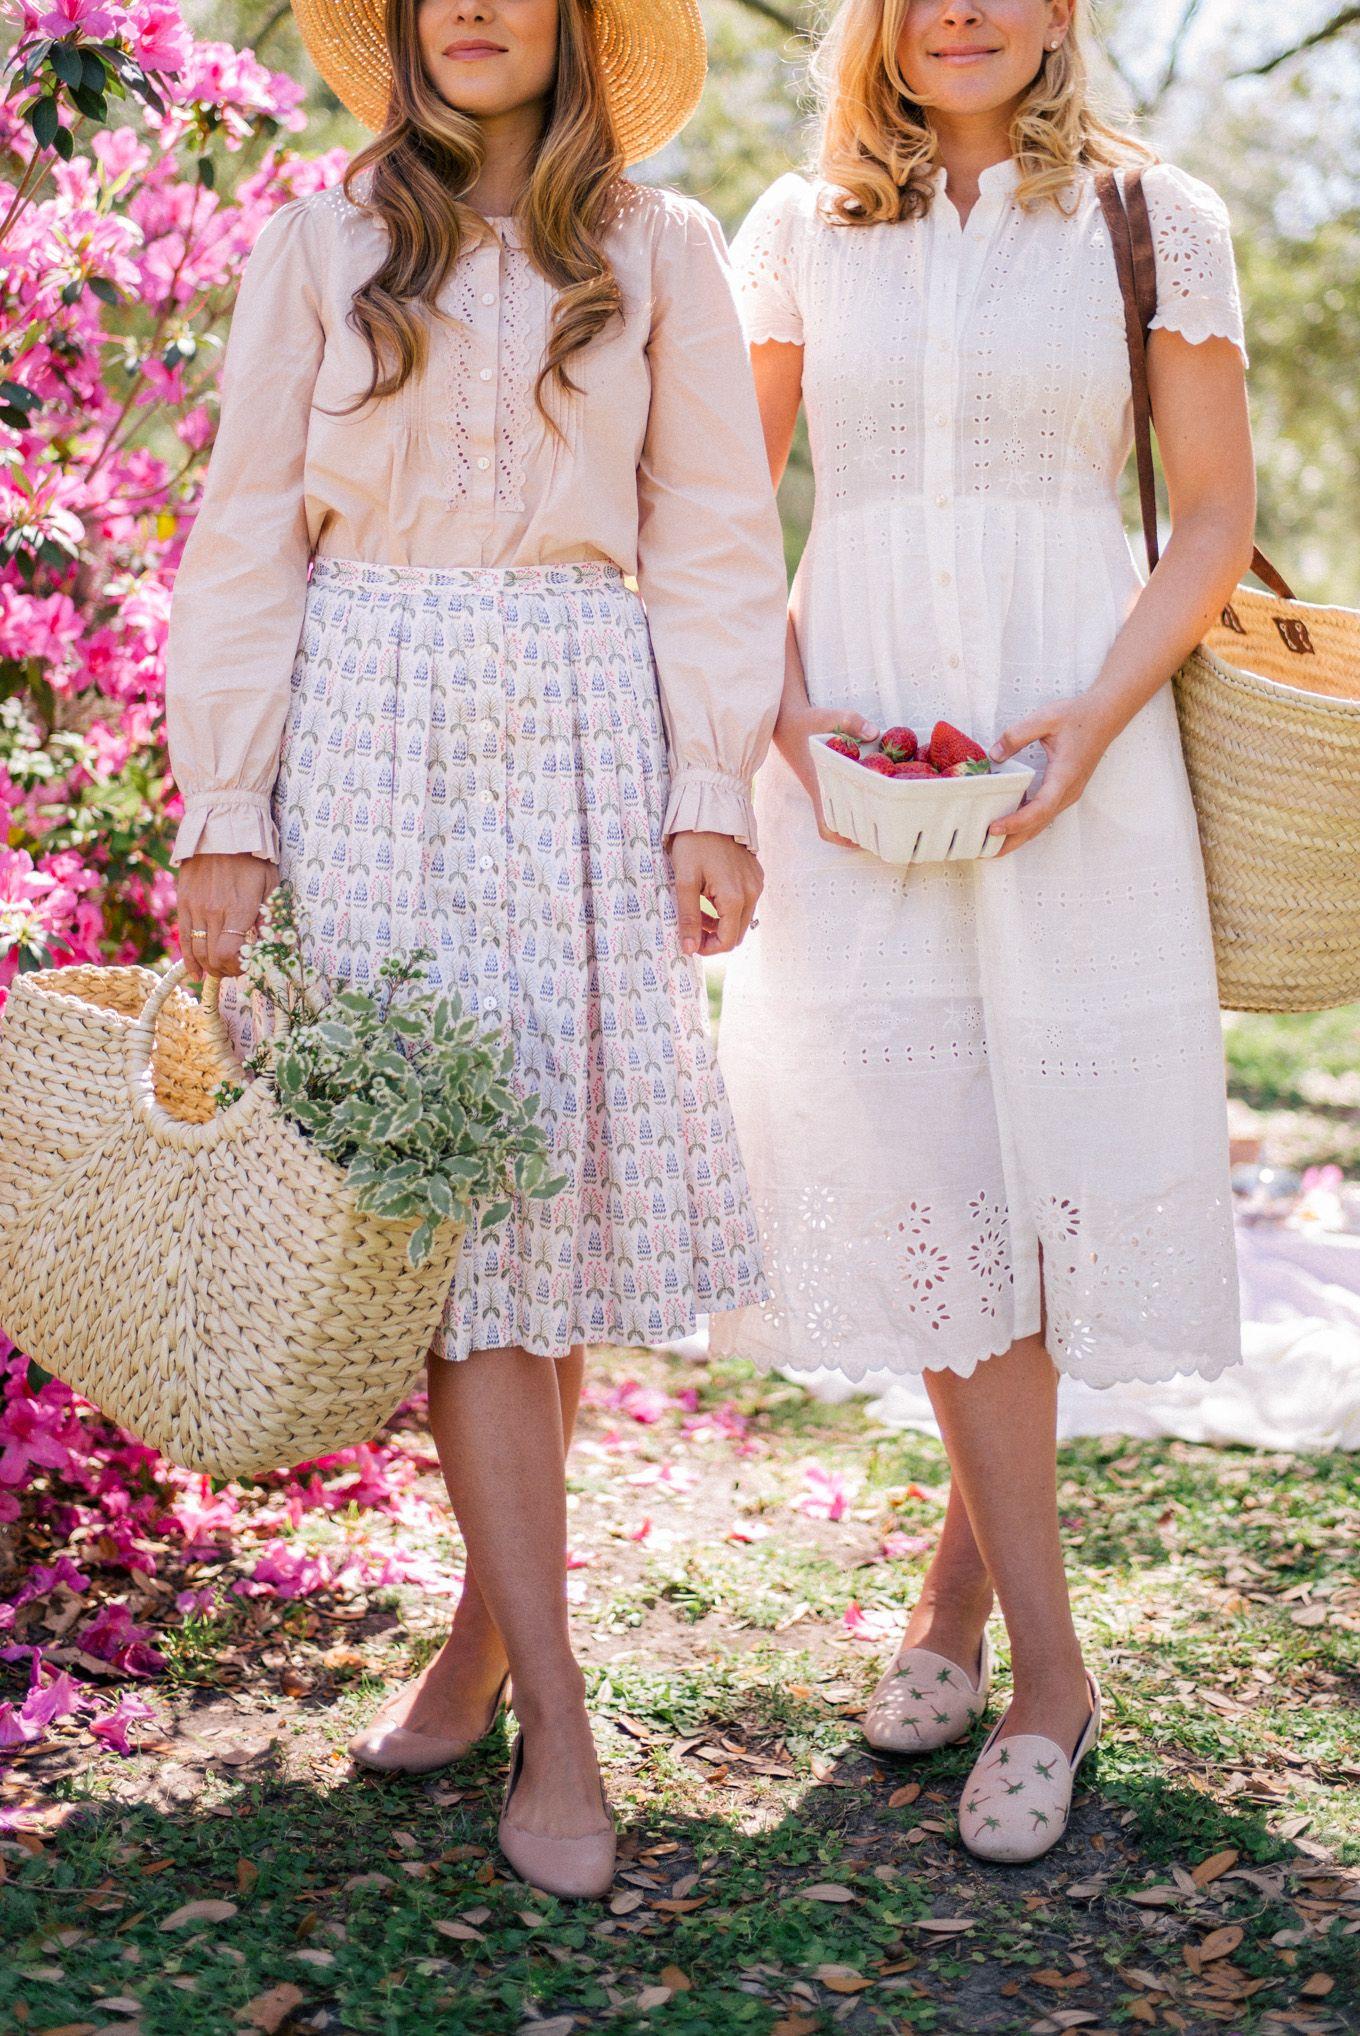 Azalea Tea Party Picnic Julia Berolzheimer Tea Party Outfits Picnic Outfits Modest Outfits [ 2036 x 1360 Pixel ]